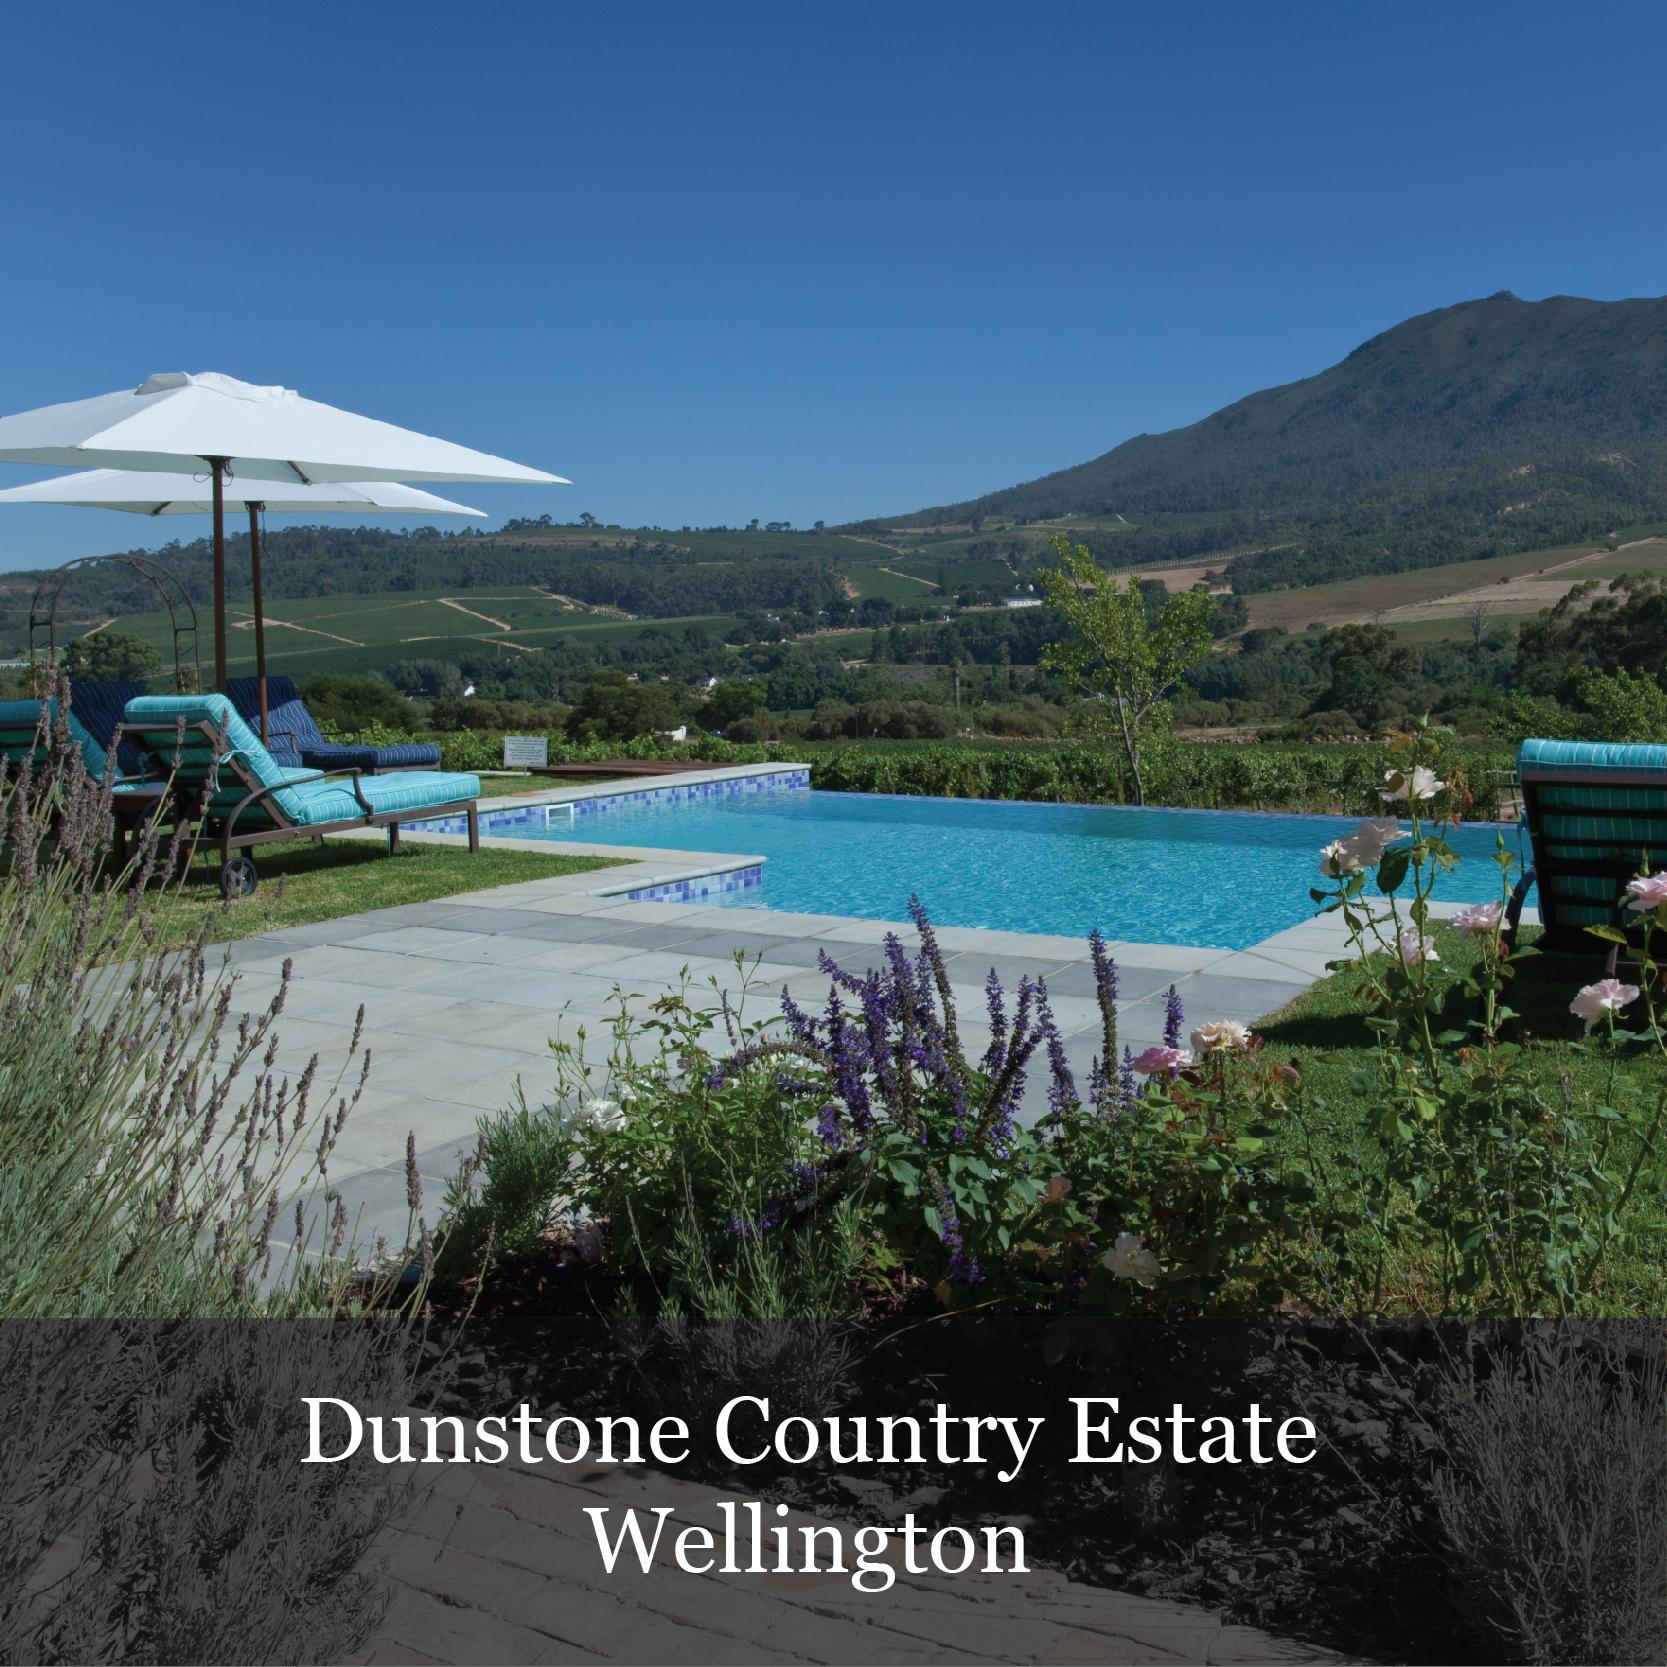 dunstone country estate